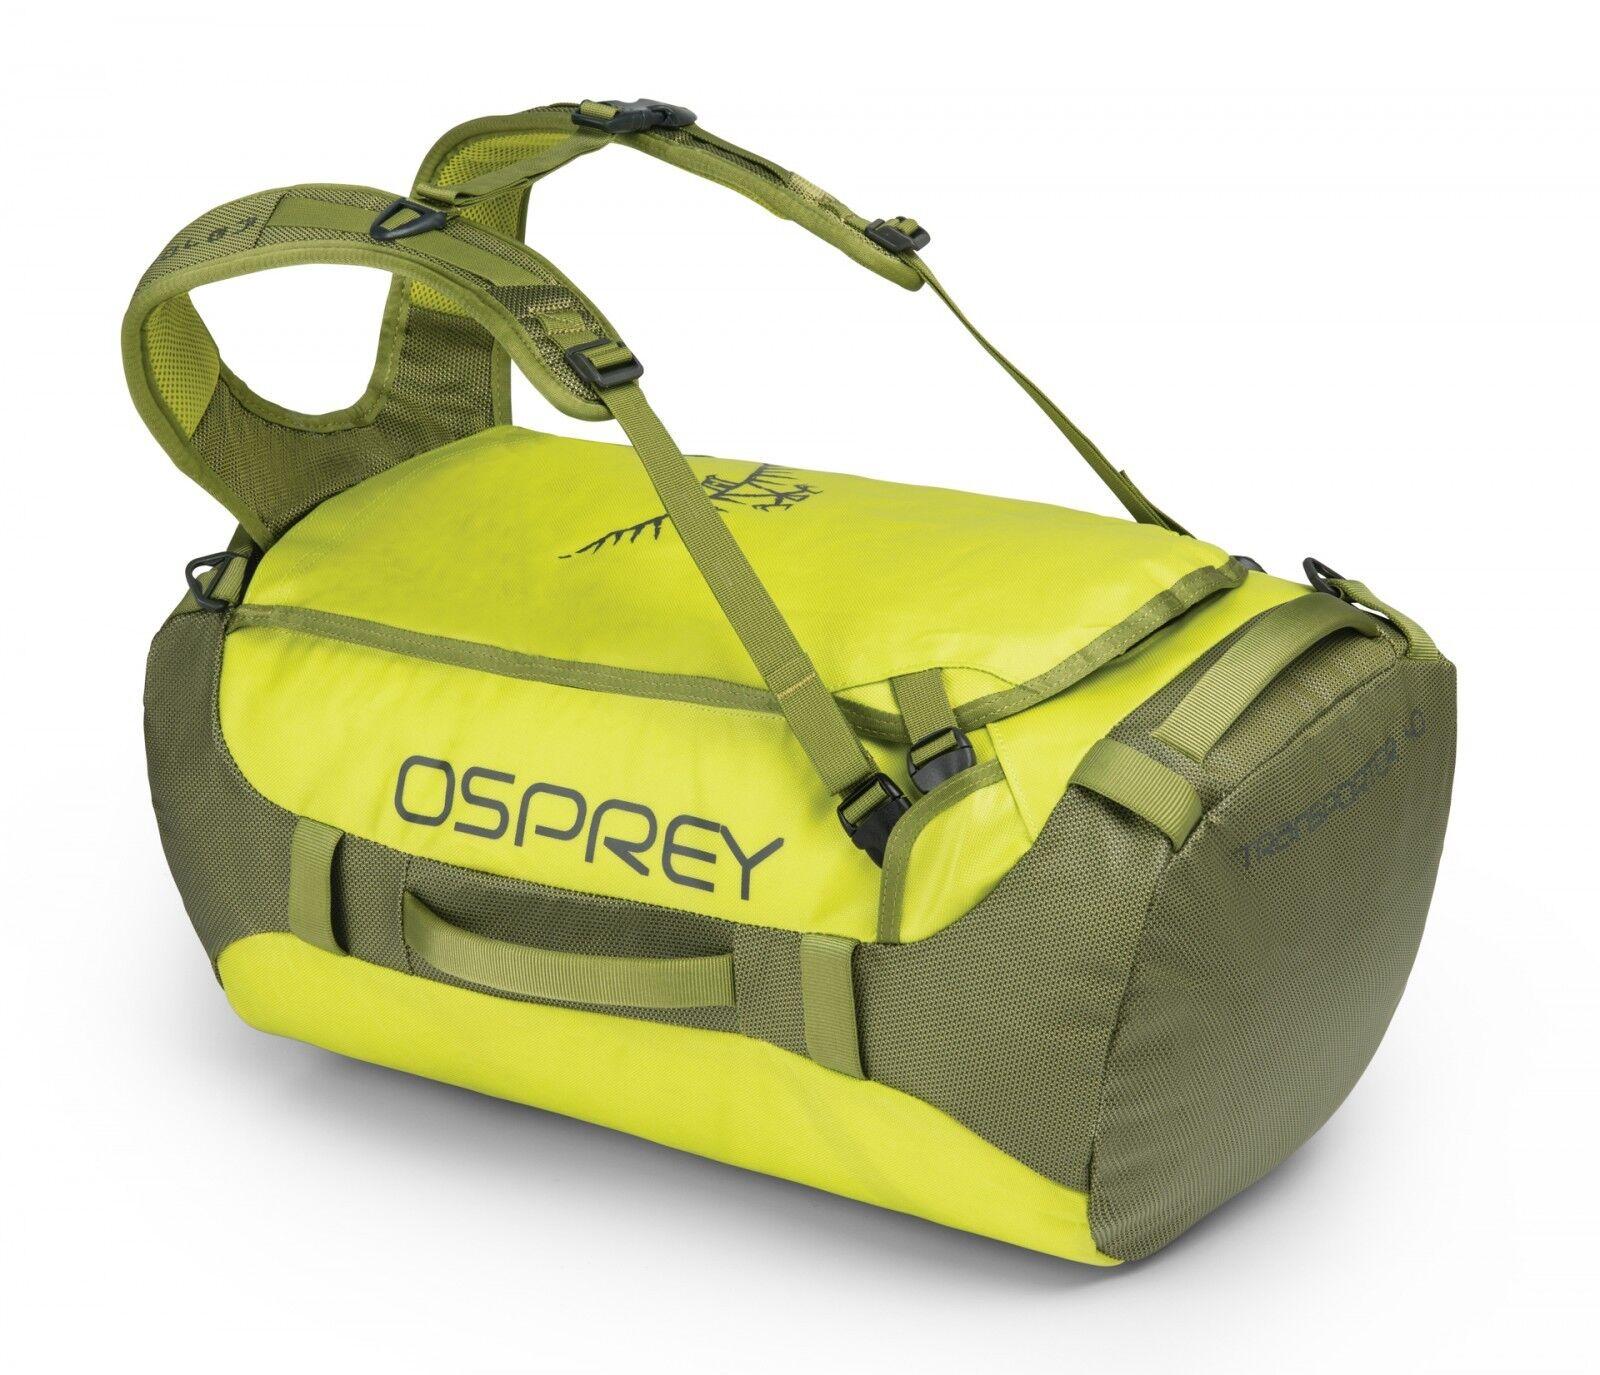 Osprey Osprey Osprey Sac À Dos Transporter 40 Sub Lime b8a615